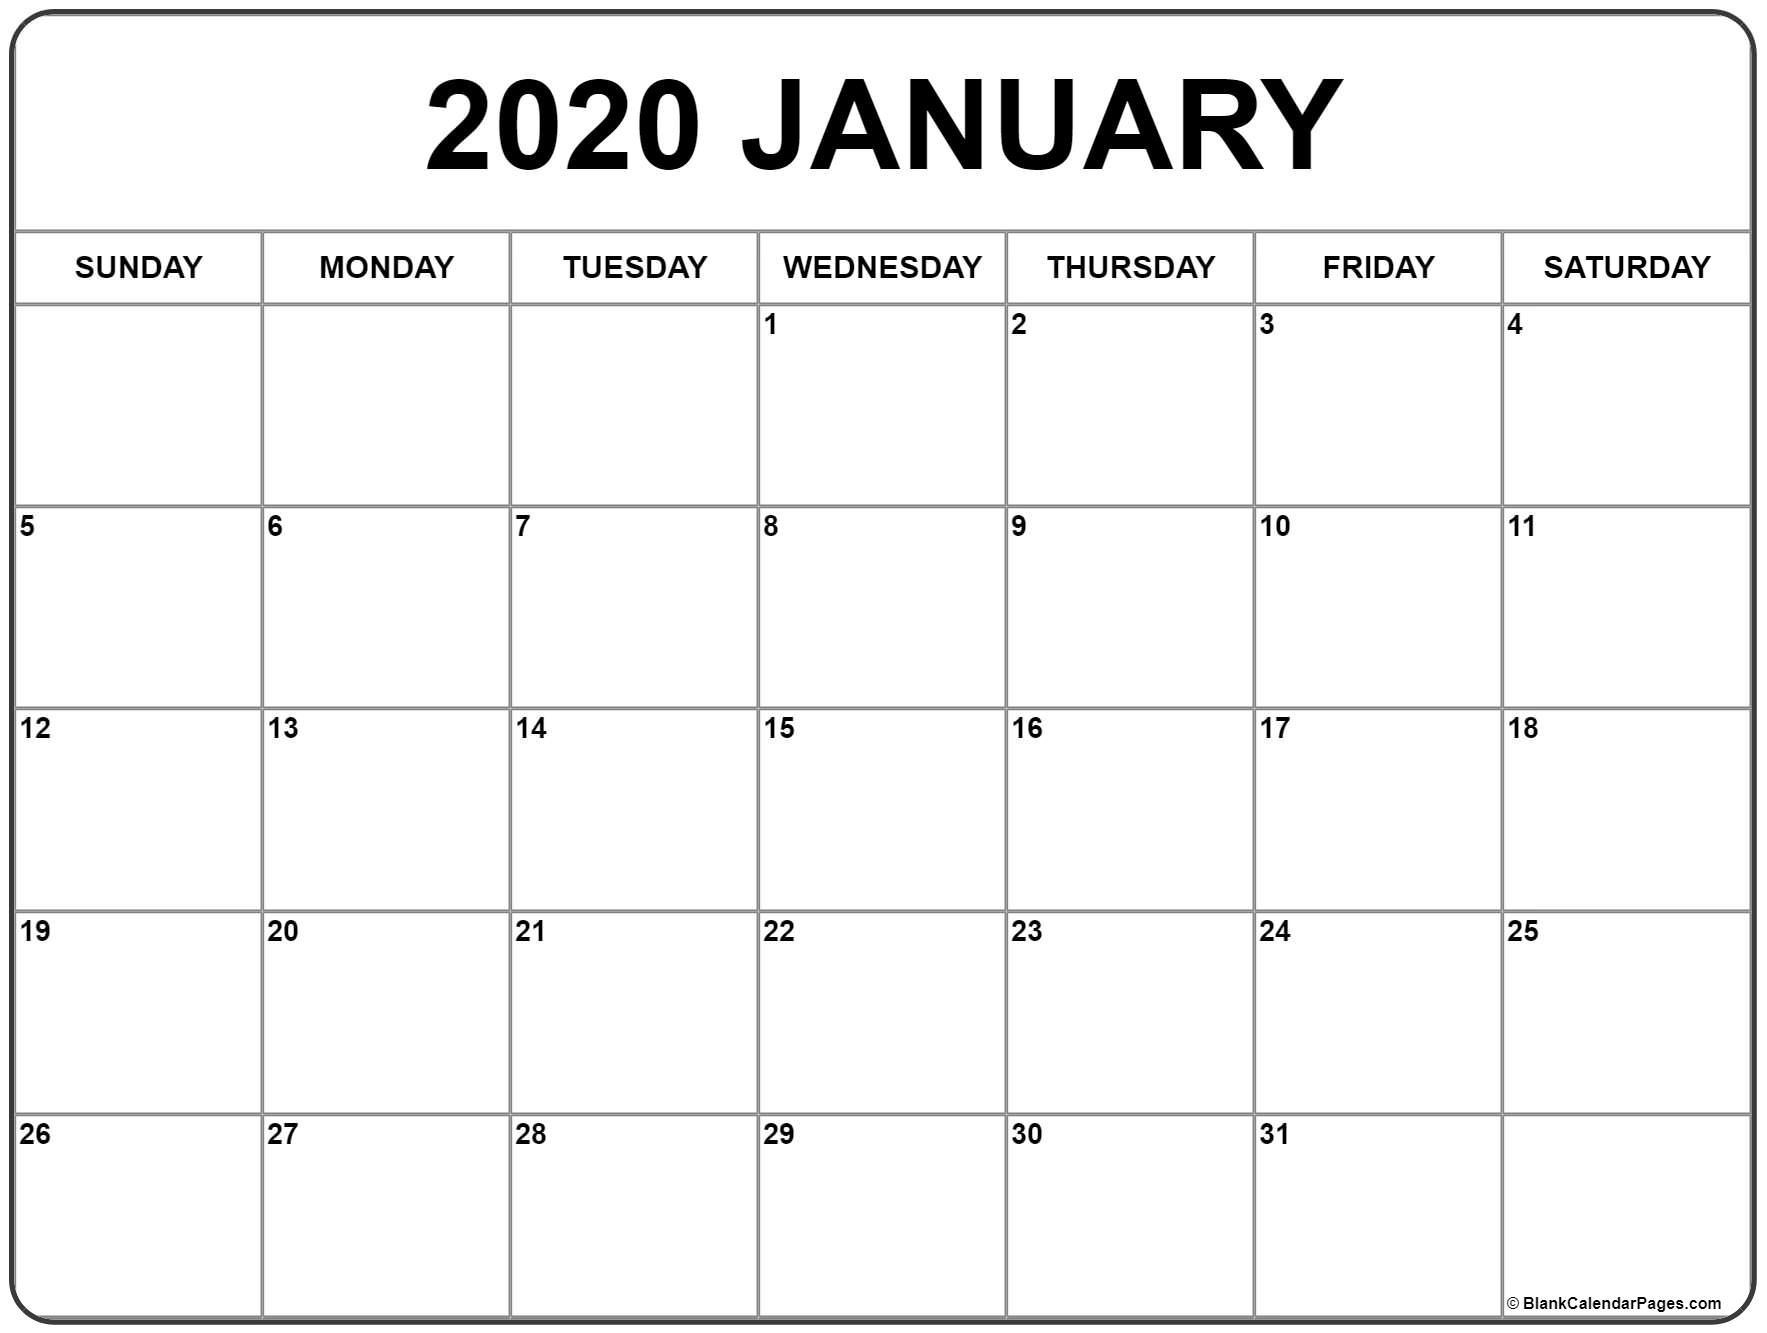 January 2020 Calendar | Free Printable Monthly Calendars-January 2020 Calendar South Africa